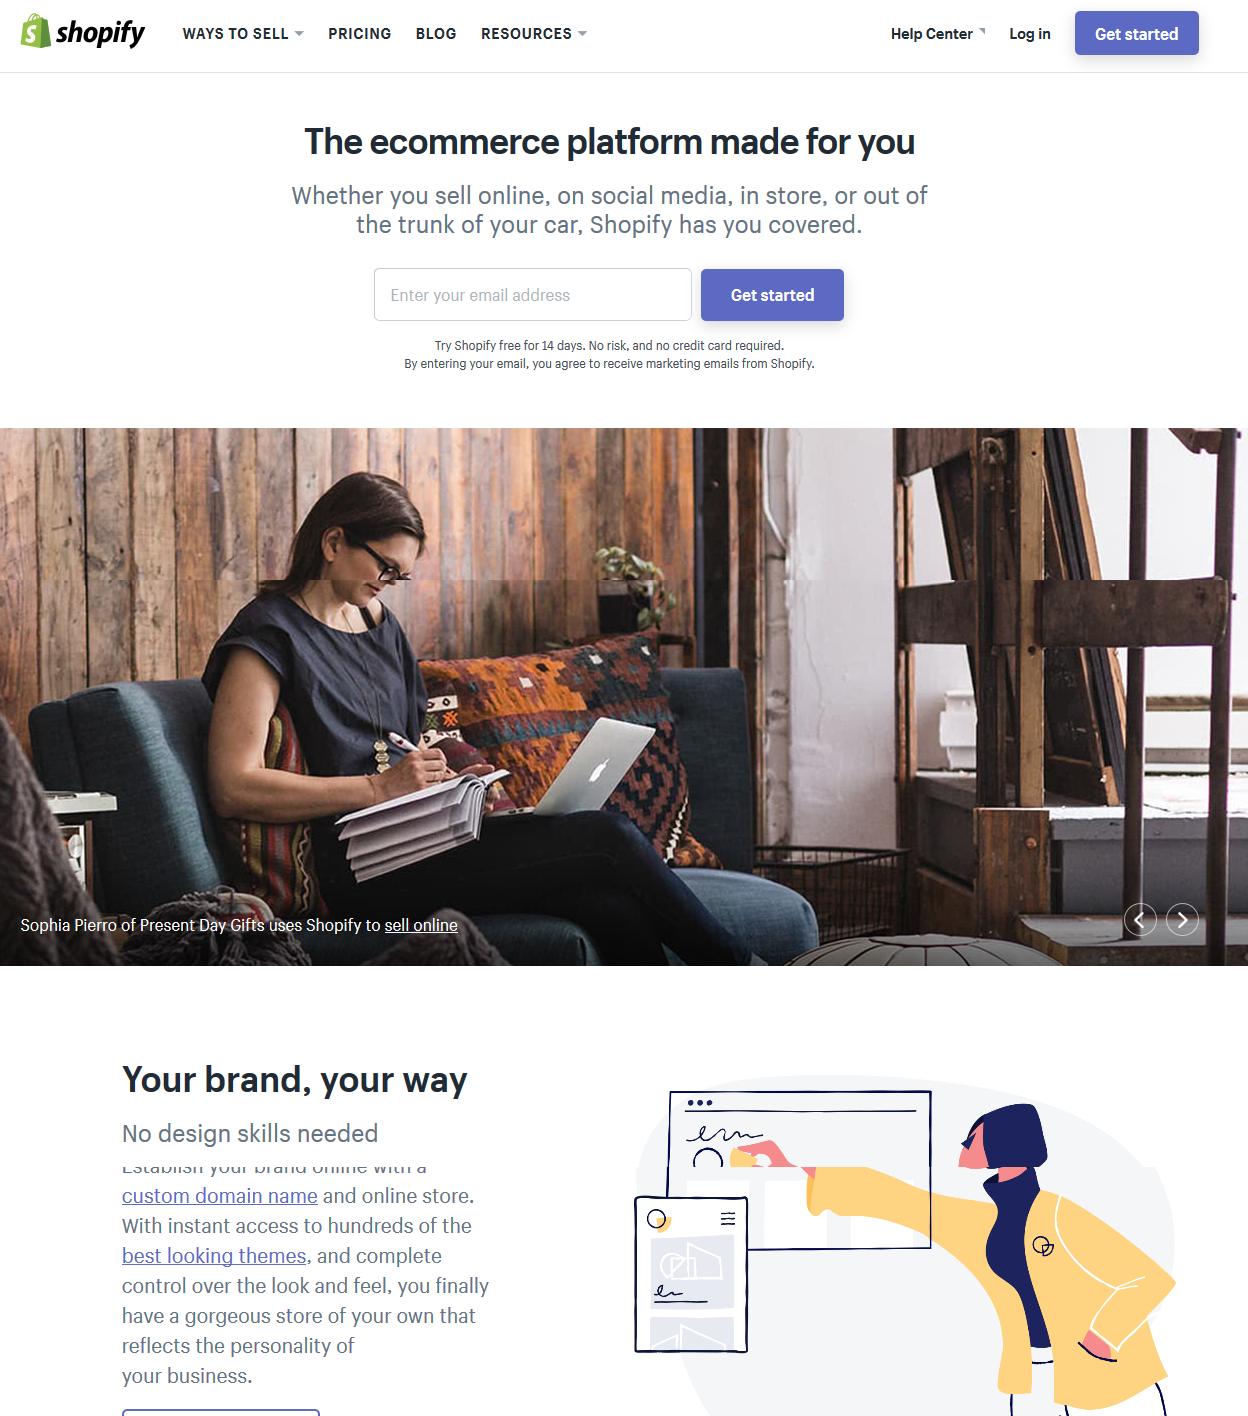 ecommerce service providers